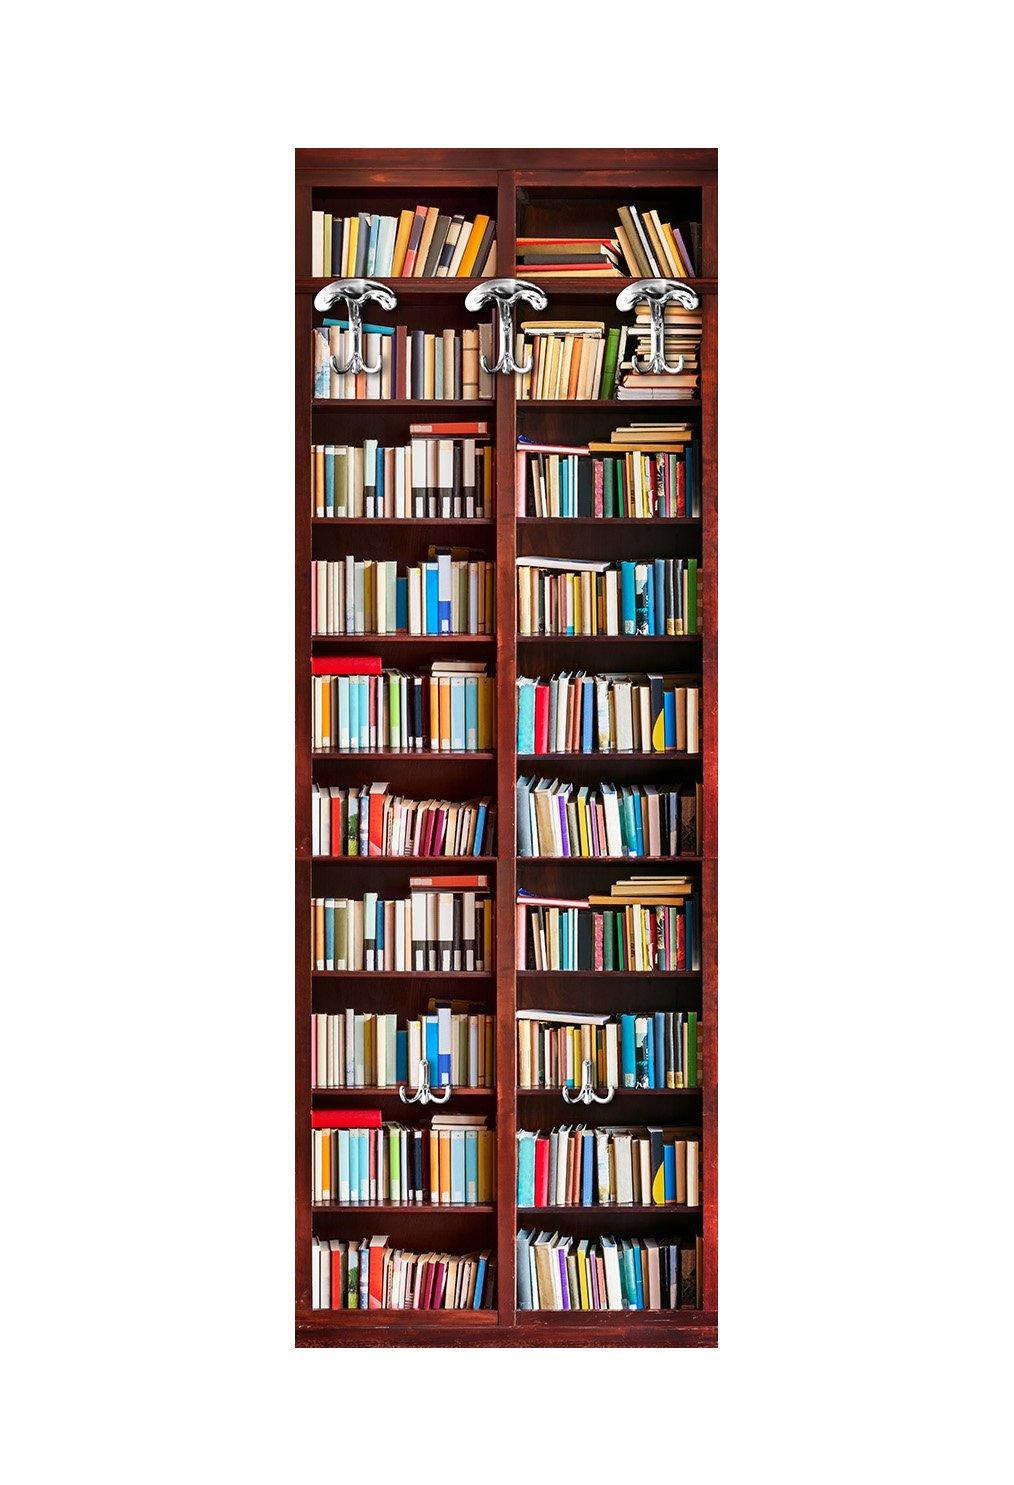 Viscio Trading 181951 Wandgarderobe, Holz, mehrfarbig, mehrfarbig, mehrfarbig, 49 x 6 x 139 cm fd83b8